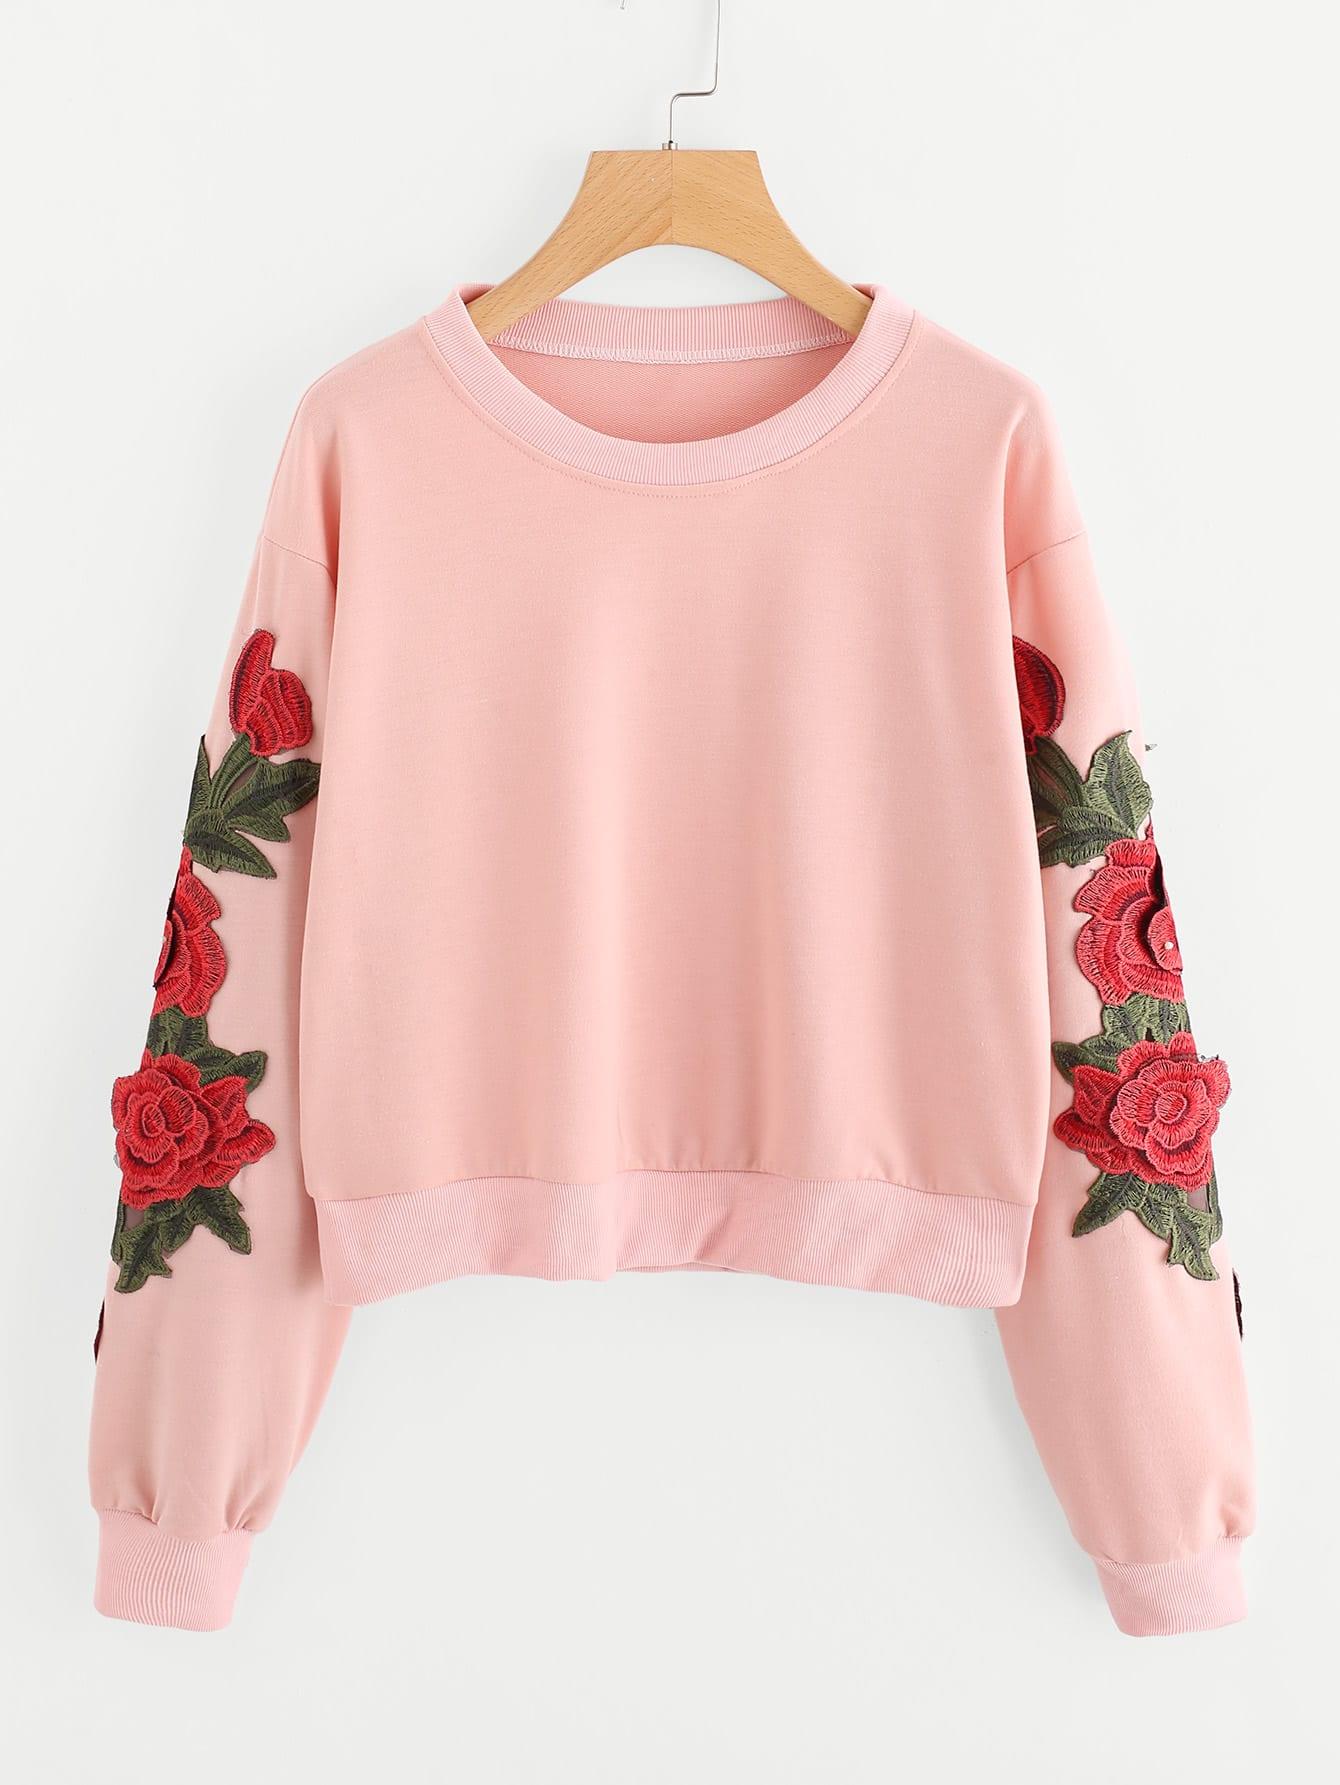 3D Embroidered Applique Crop Sweatshirt